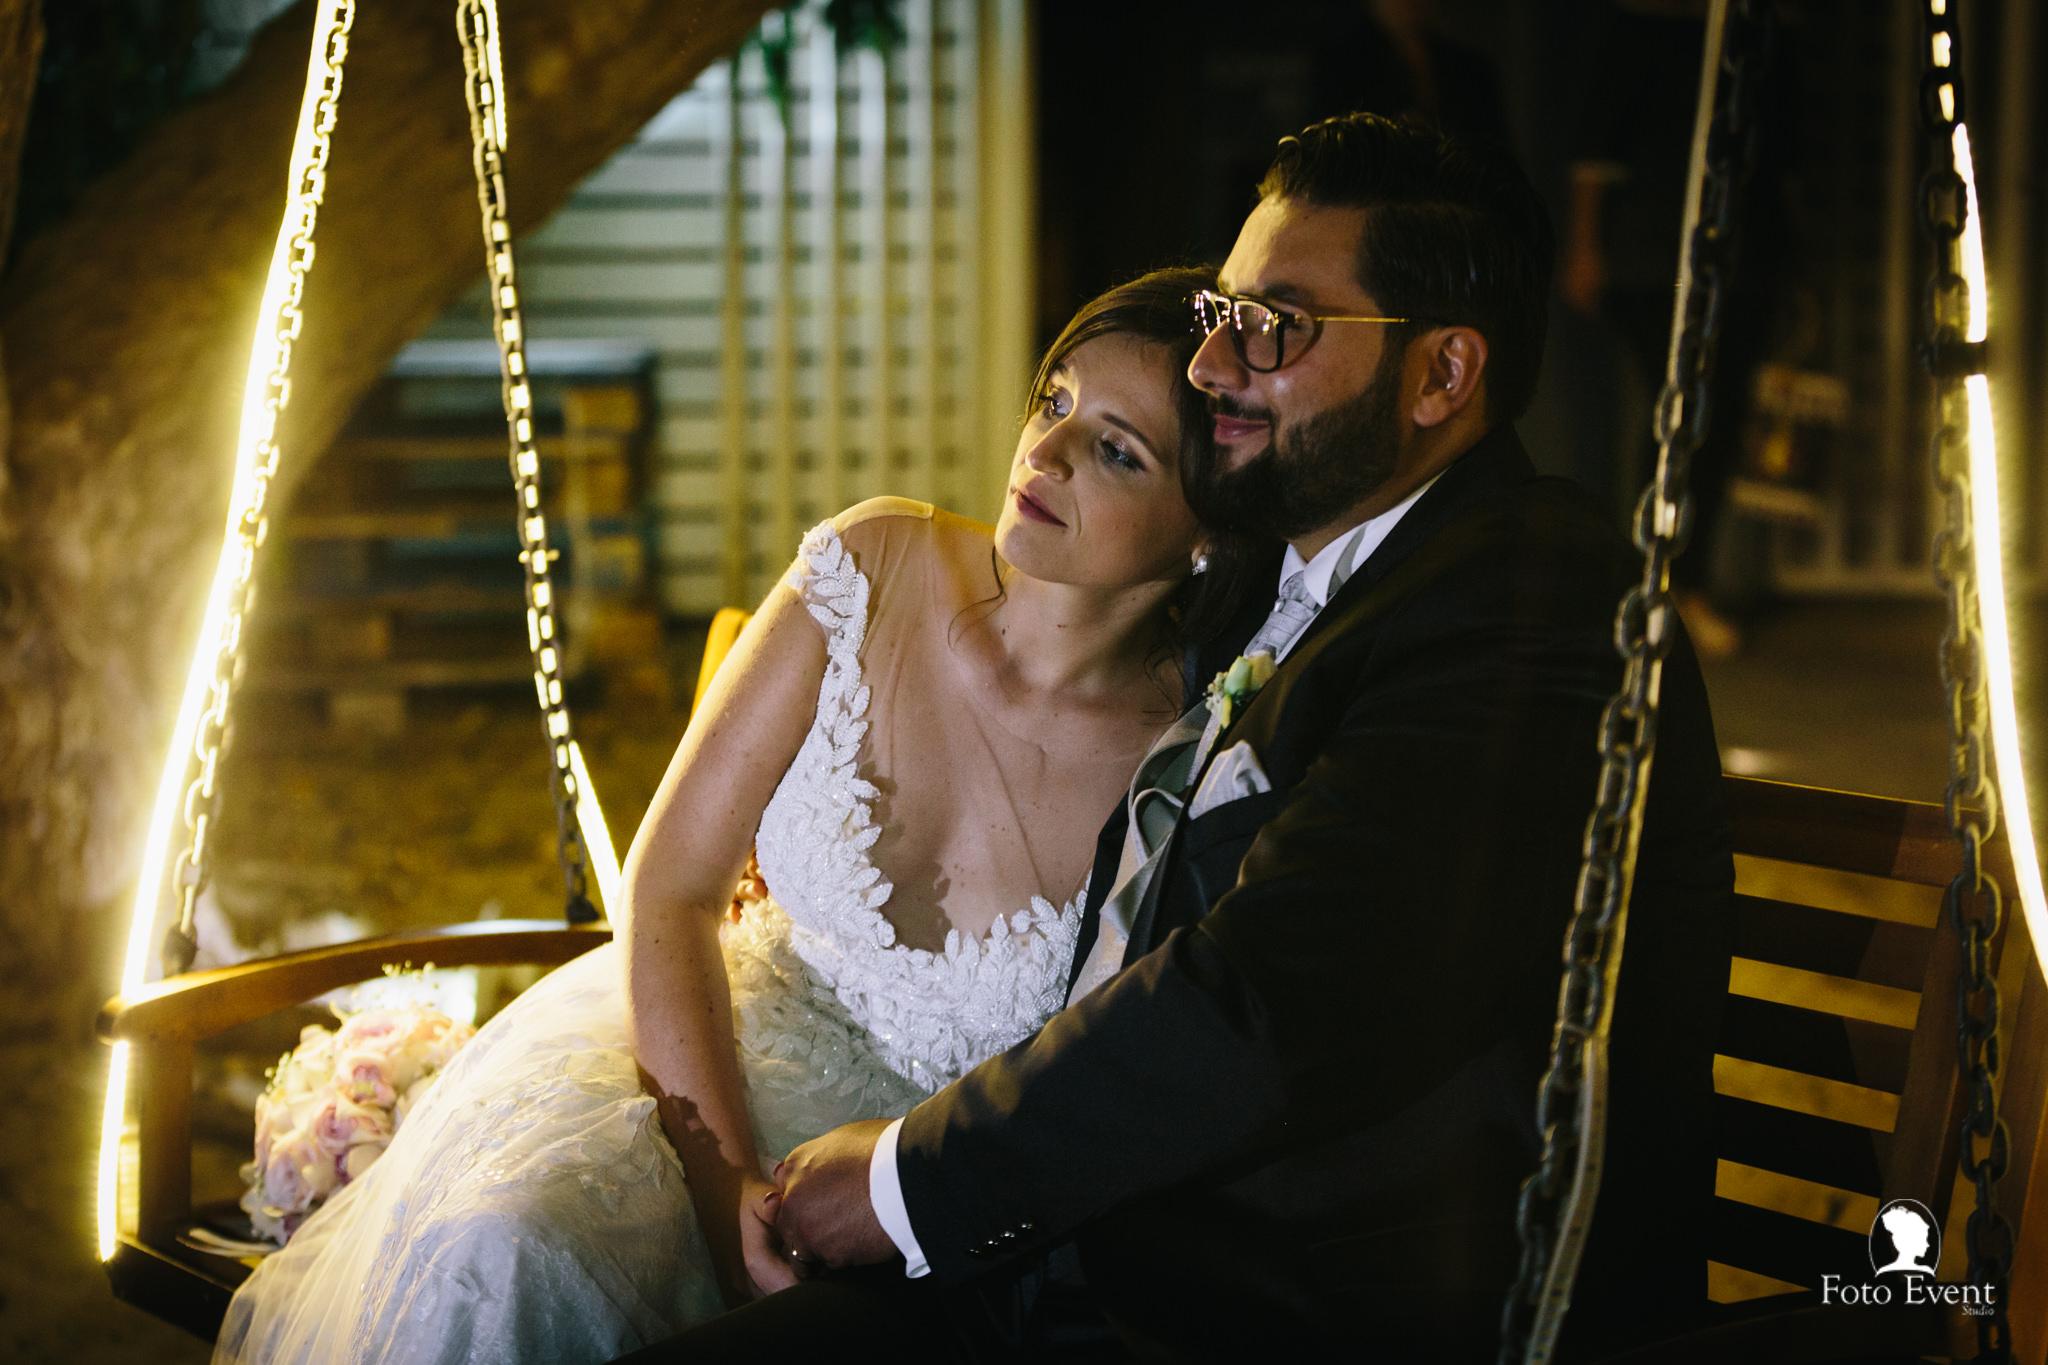 037-2019-09-09-Matrimonio-Dorotea-e-Alberto-Iemmolo-zoom-616